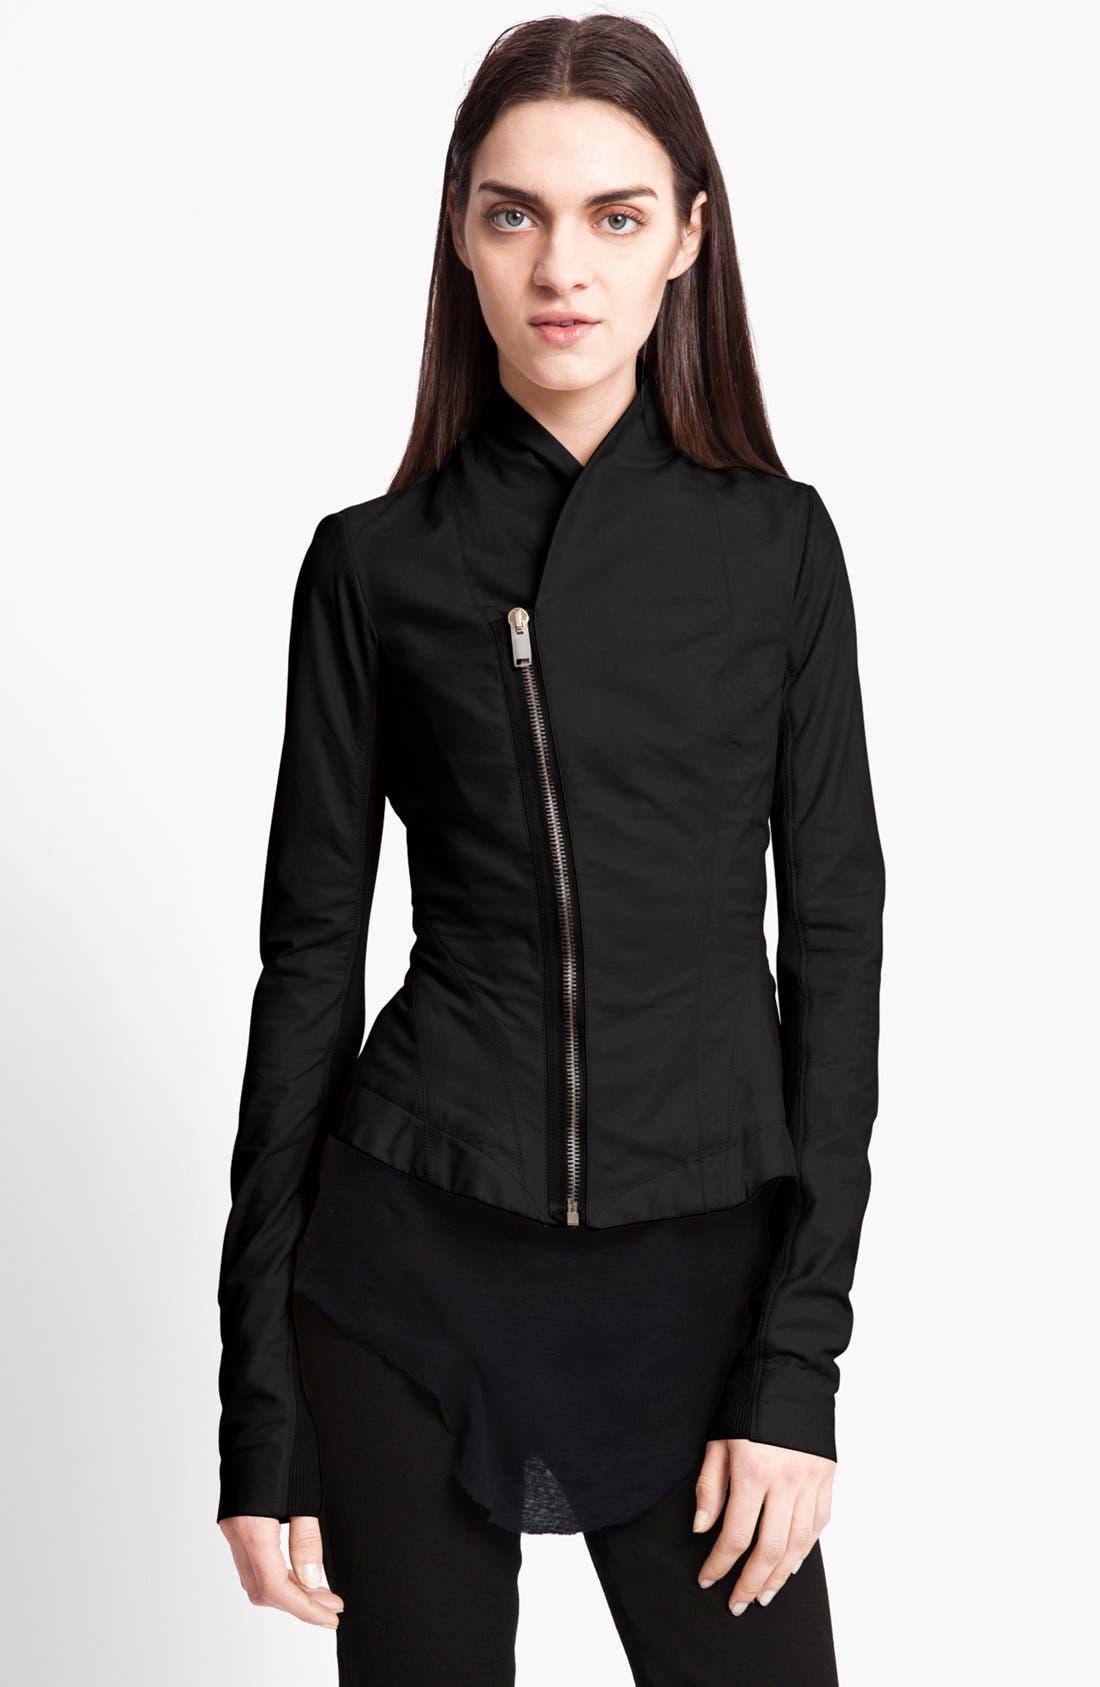 Alternate Image 1 Selected - Rick Owens Calfskin Leather Jacket